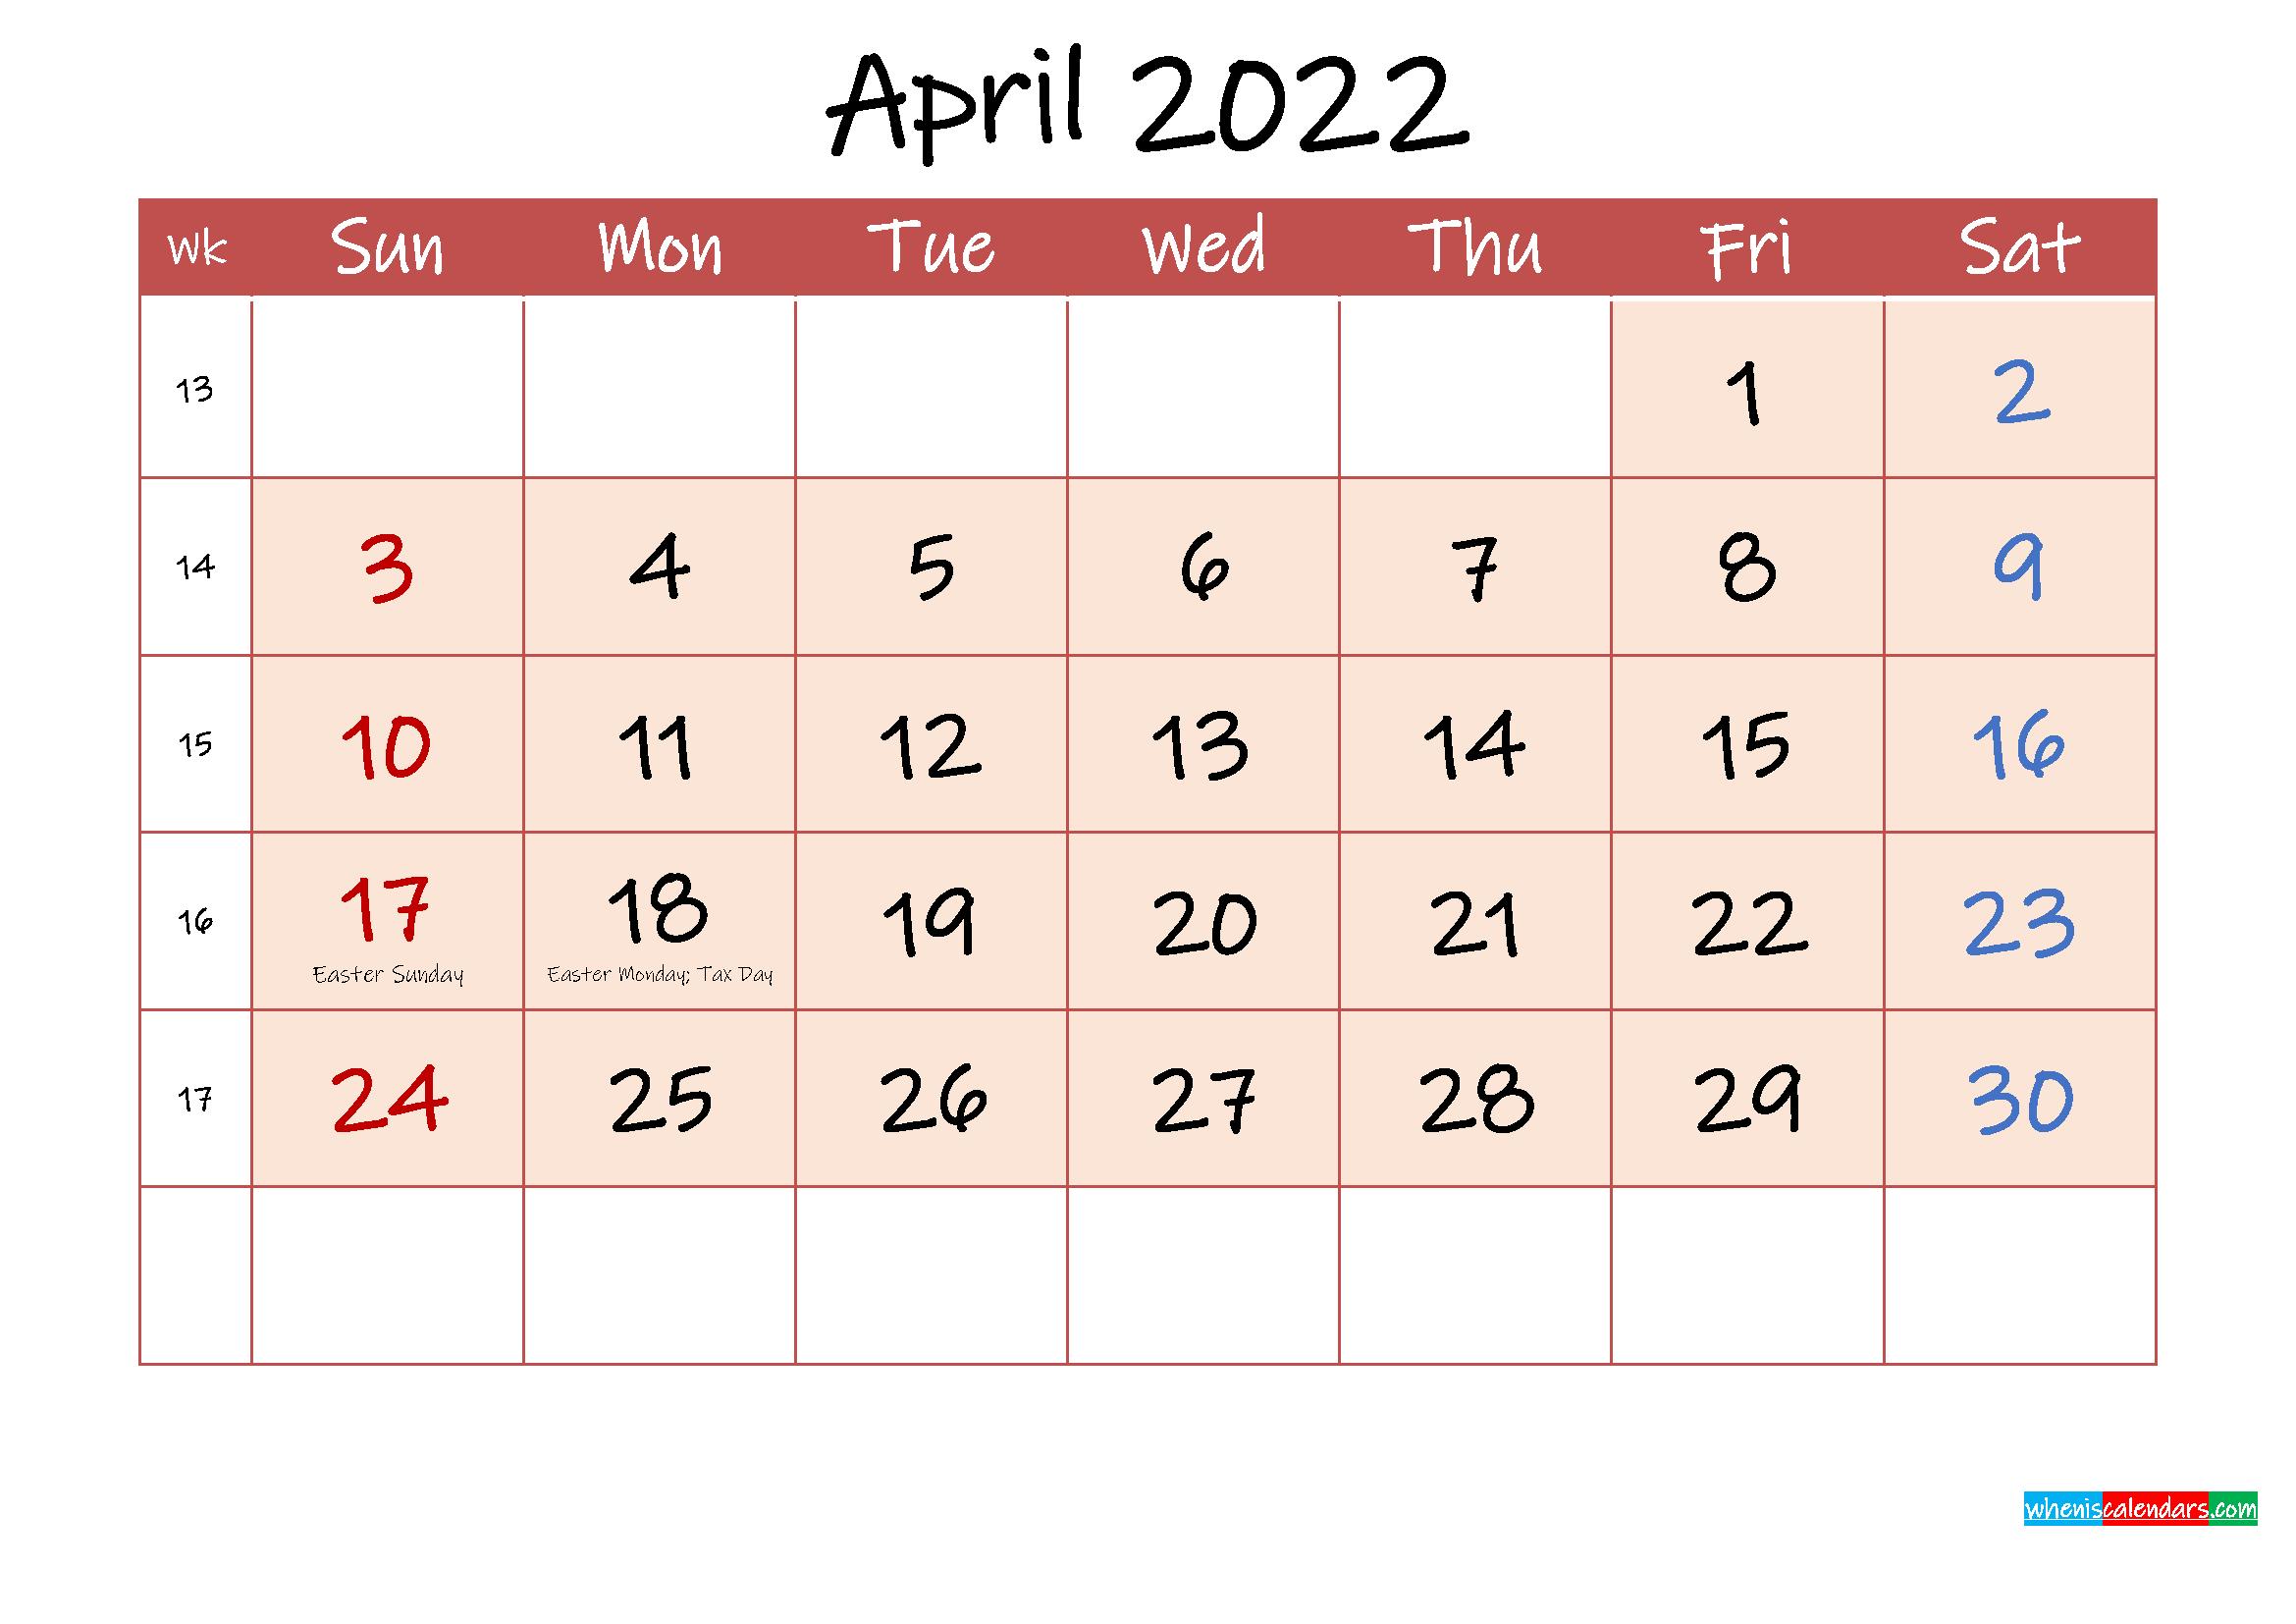 April 2022 Free Printable Calendar with Holidays ...